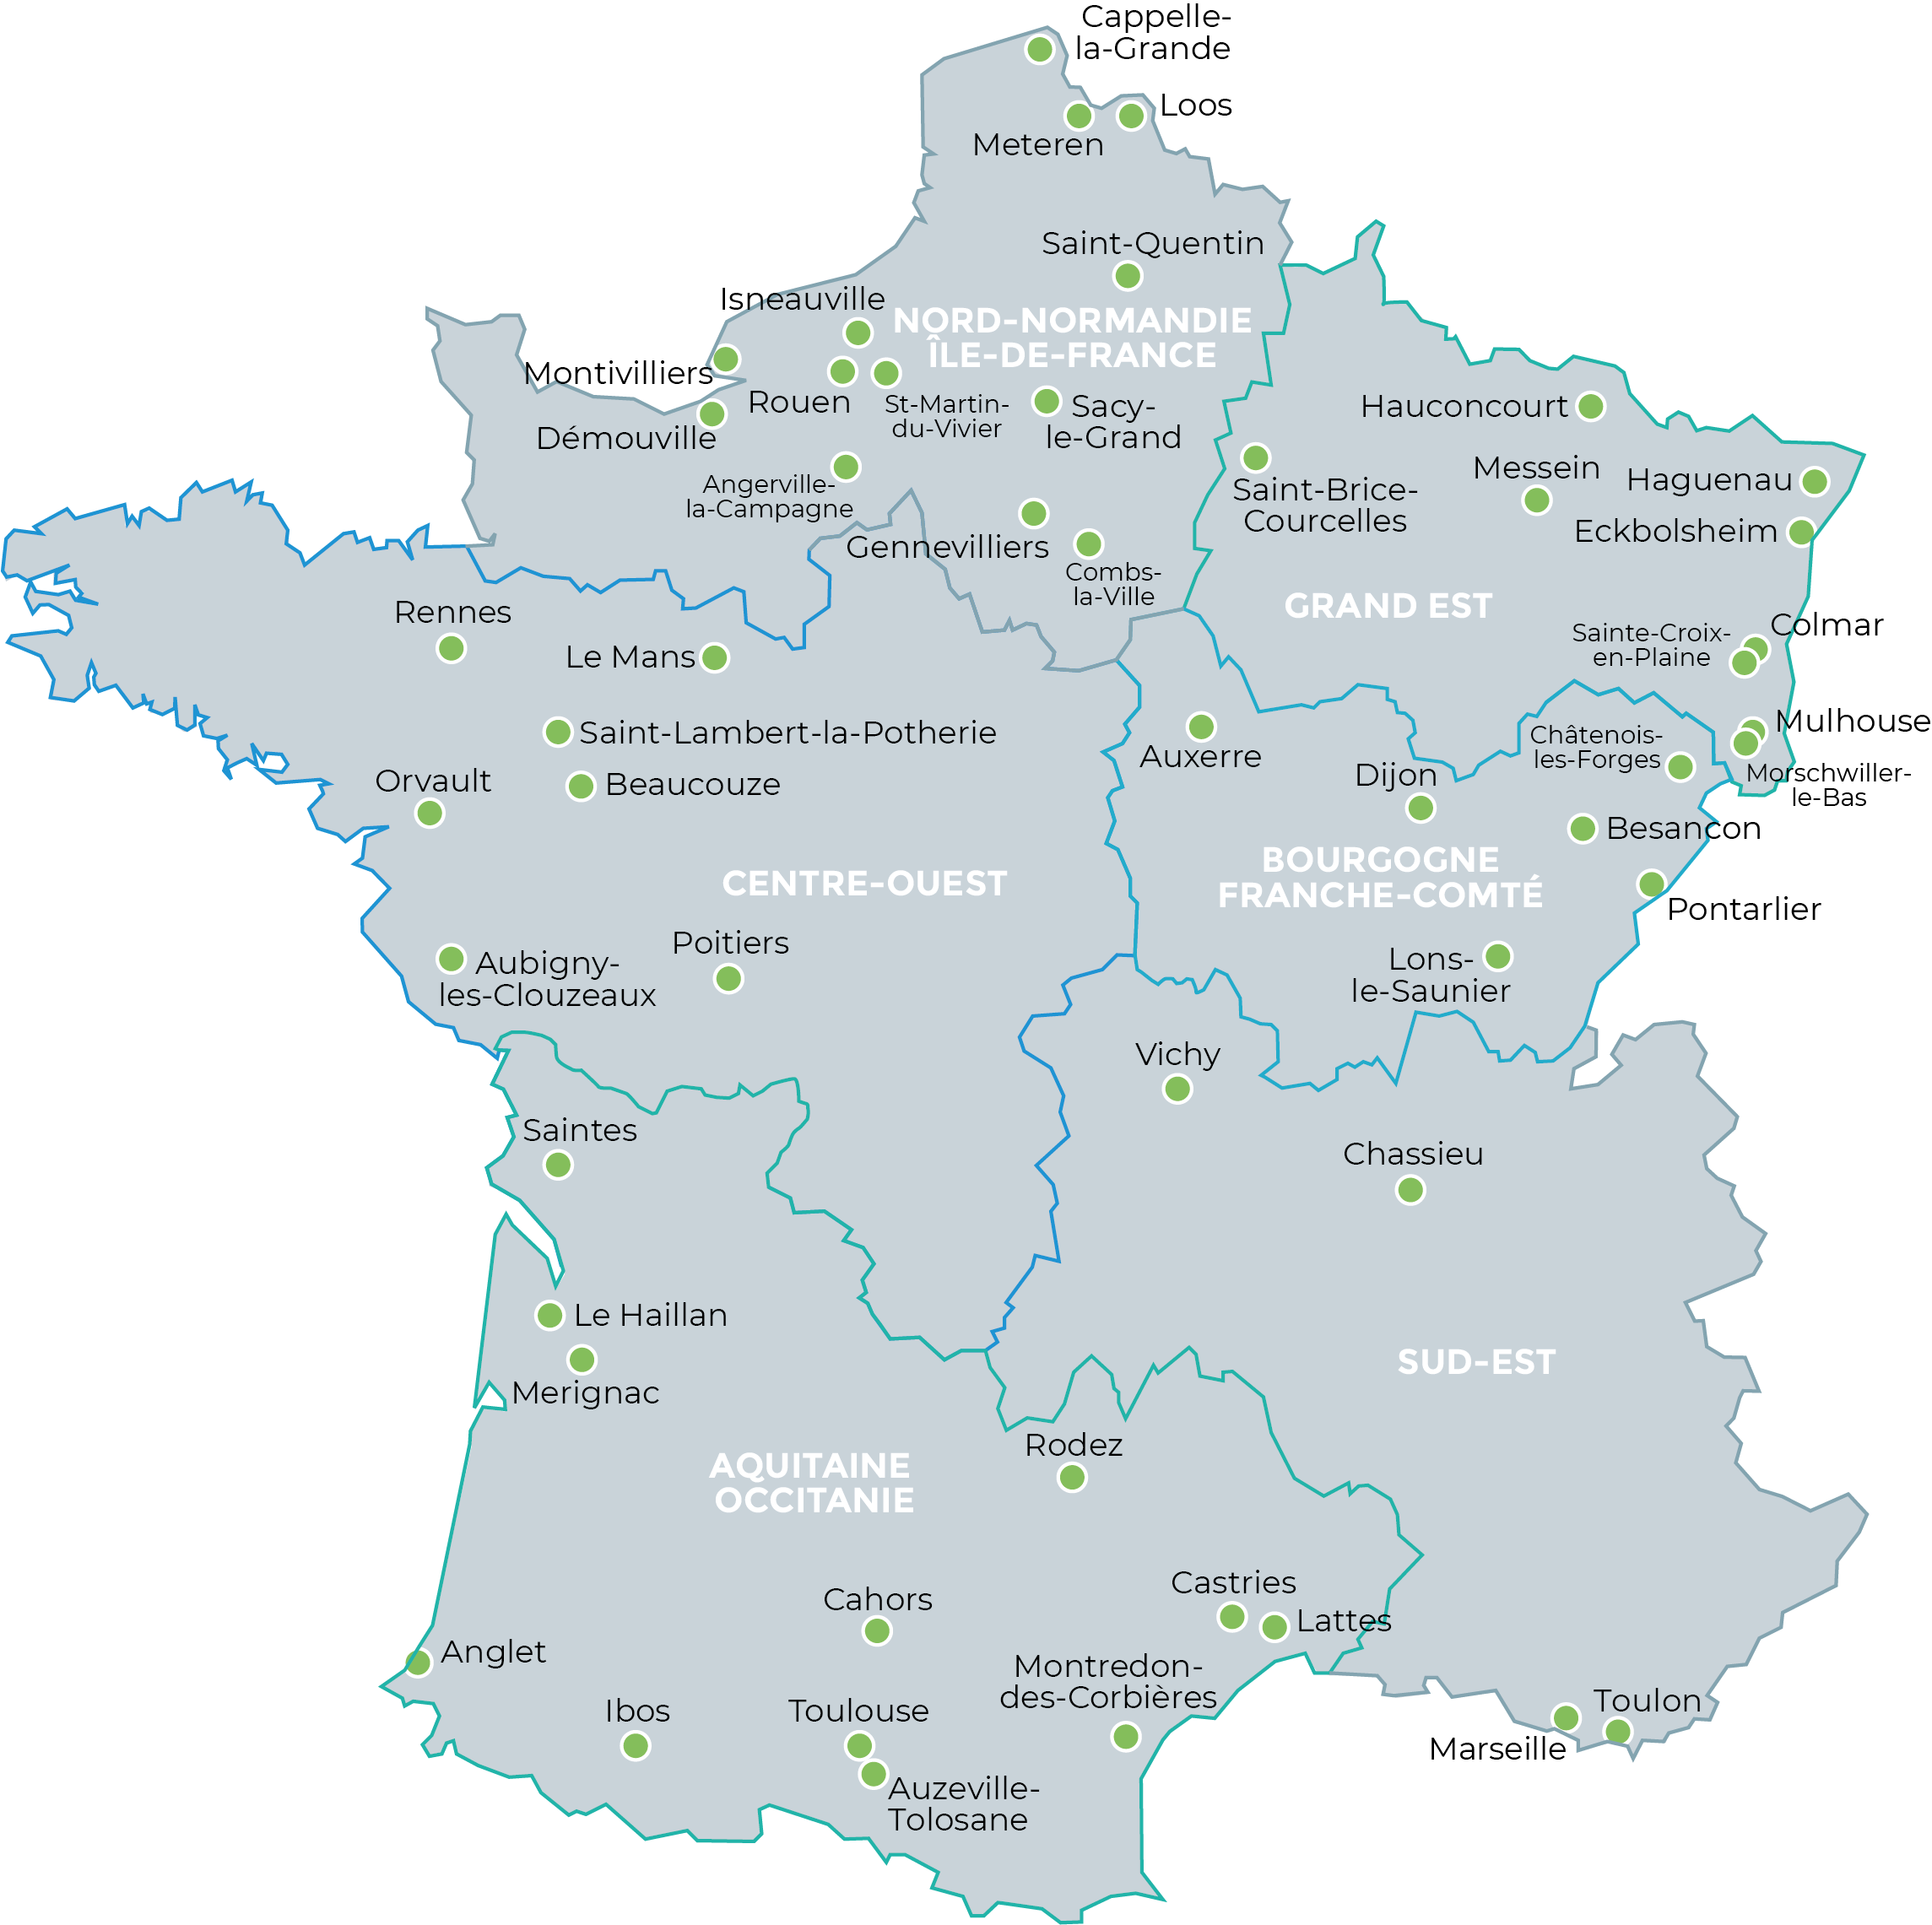 Carte de France de nos agences Asten Santé